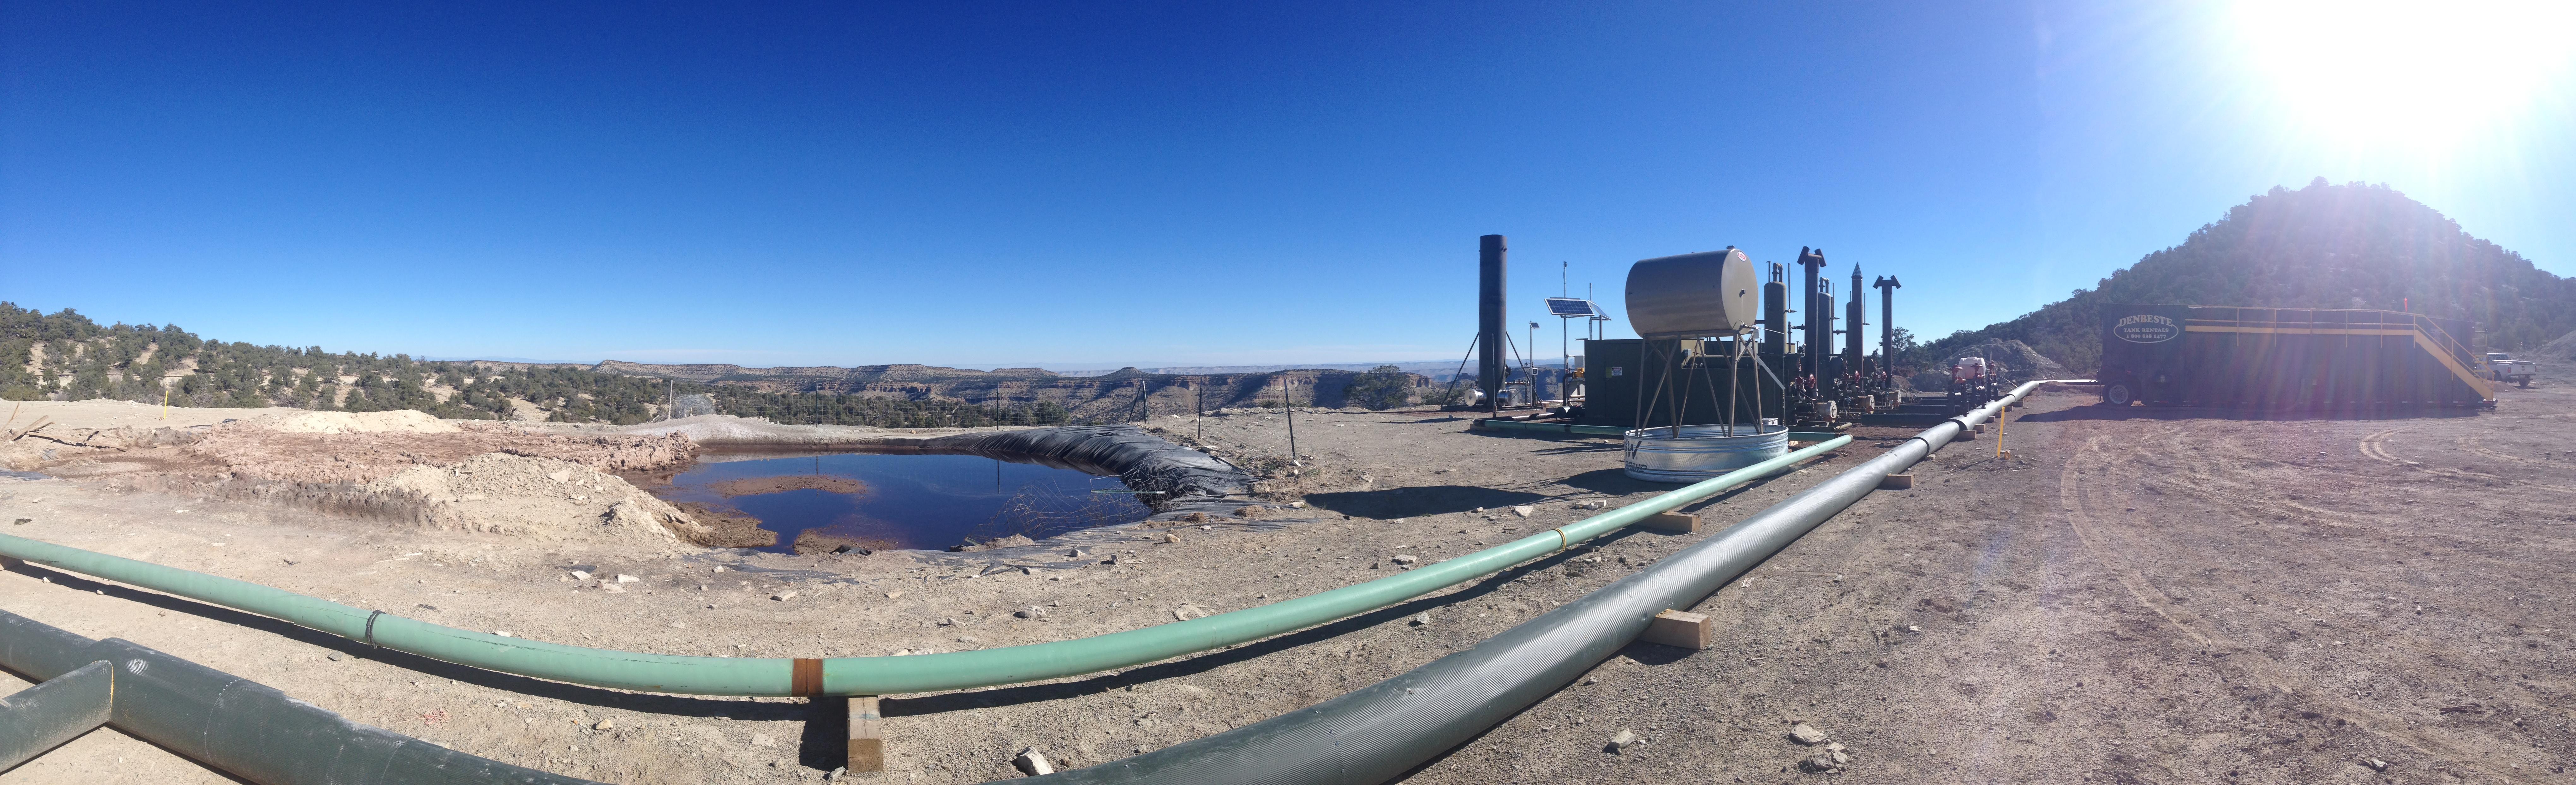 Drilling waste reserve pit